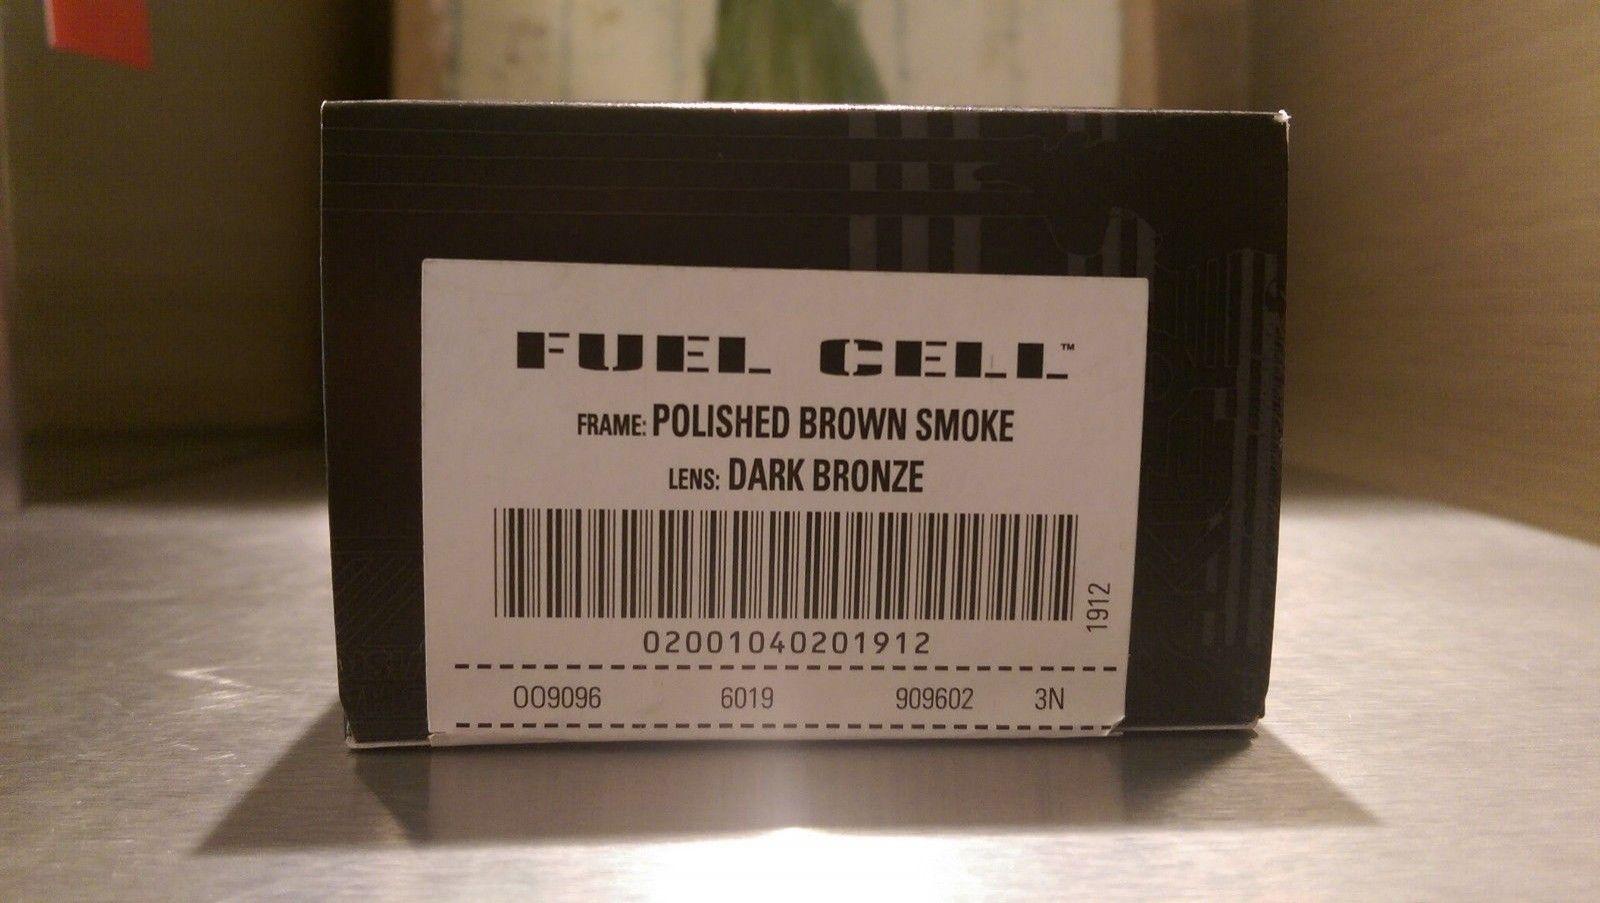 Fuel Cell Brown smoke/dark bronze BNIB - s-l1600.jpg